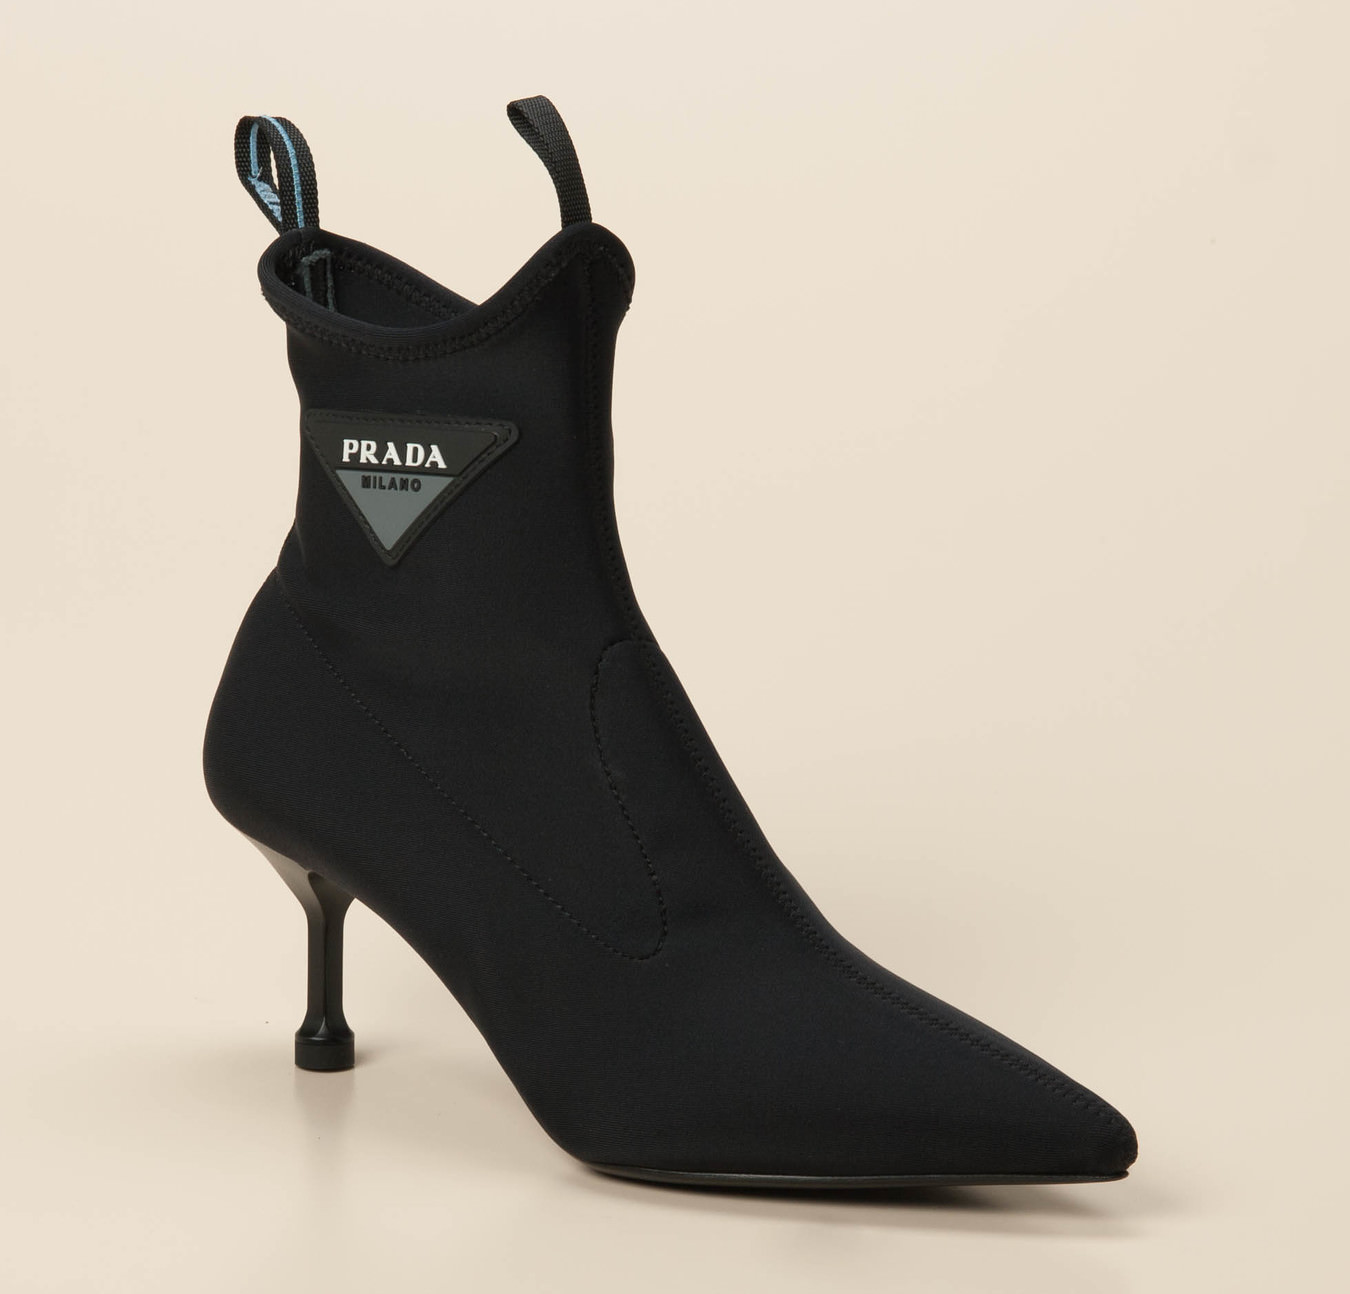 229a5e9fa3330 Prada Damen Stiefelette in schwarz kaufen